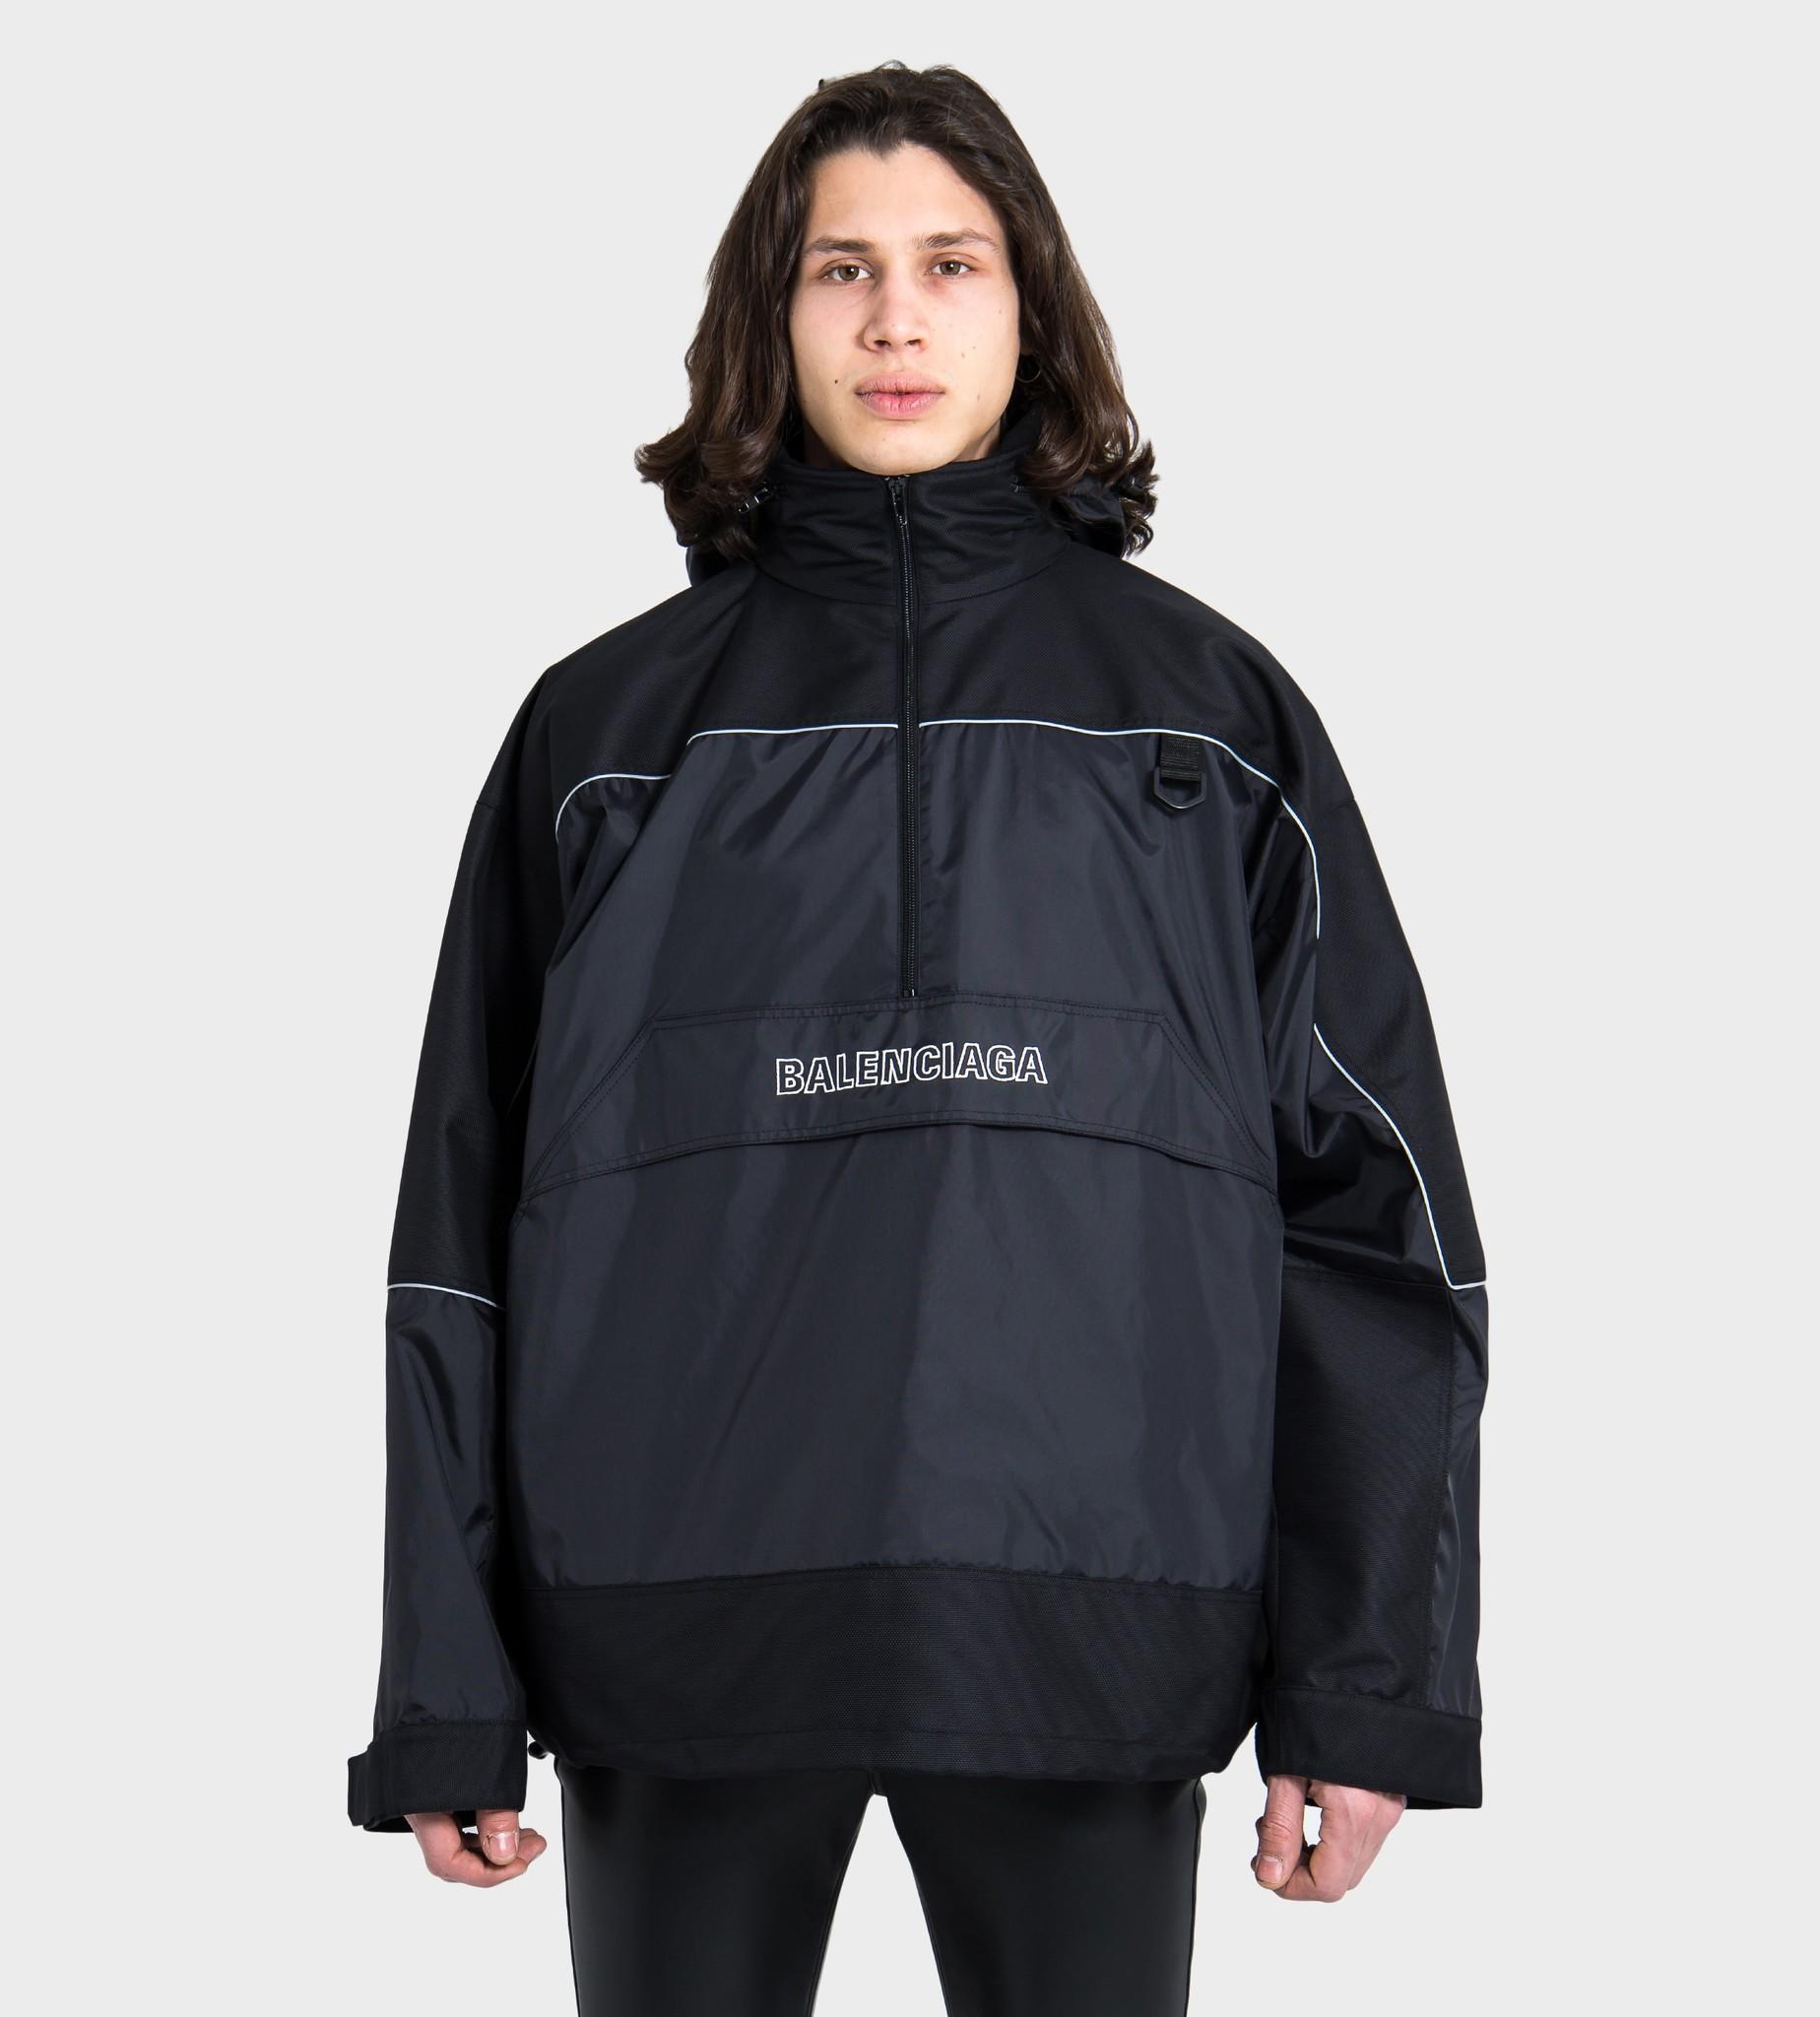 533917 Jacket 1069 Balenciaga Four Black Amsterdam Tao18 RSqTCTxw